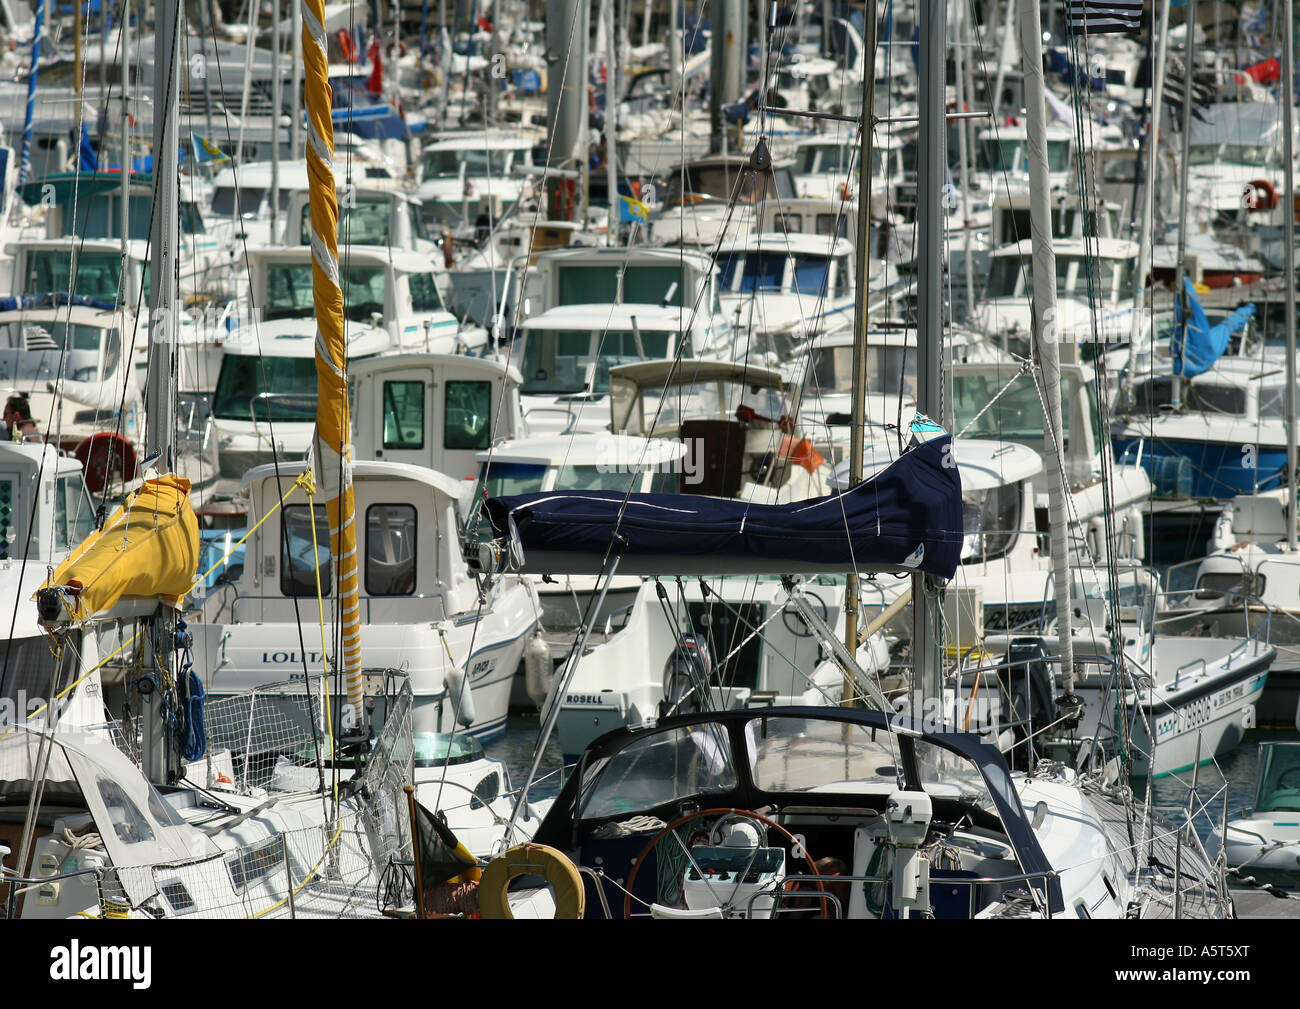 Boats in marina, full frame - Stock Image